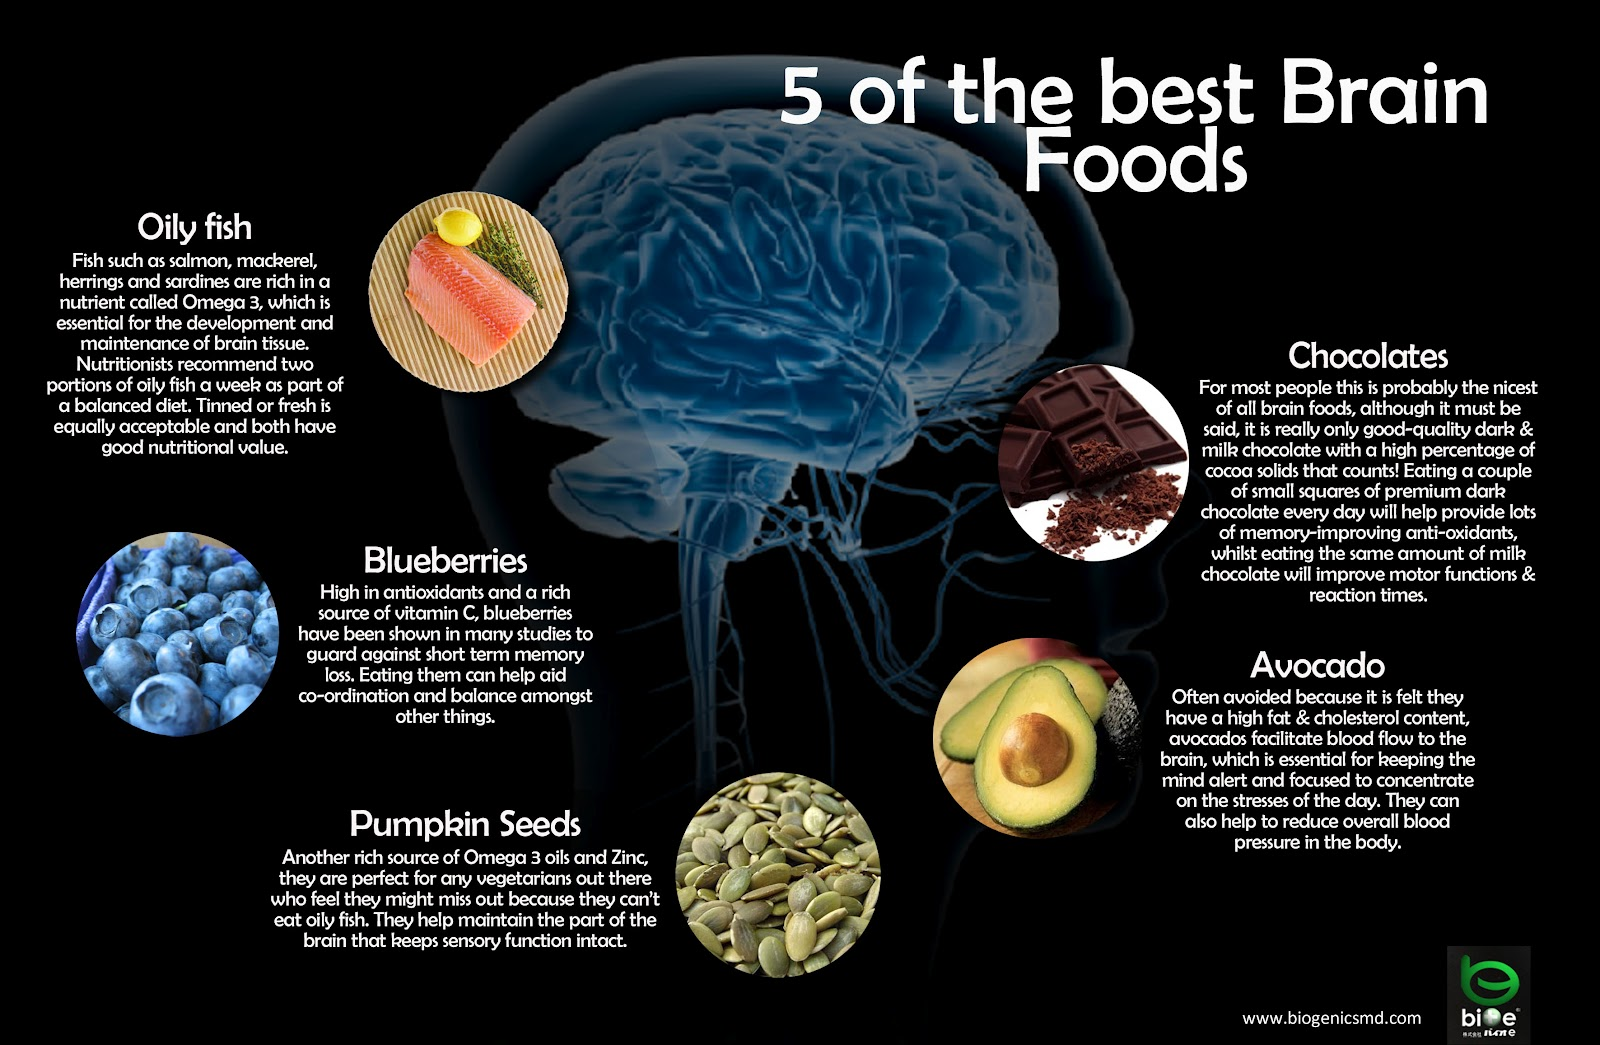 5 brain food.jpg